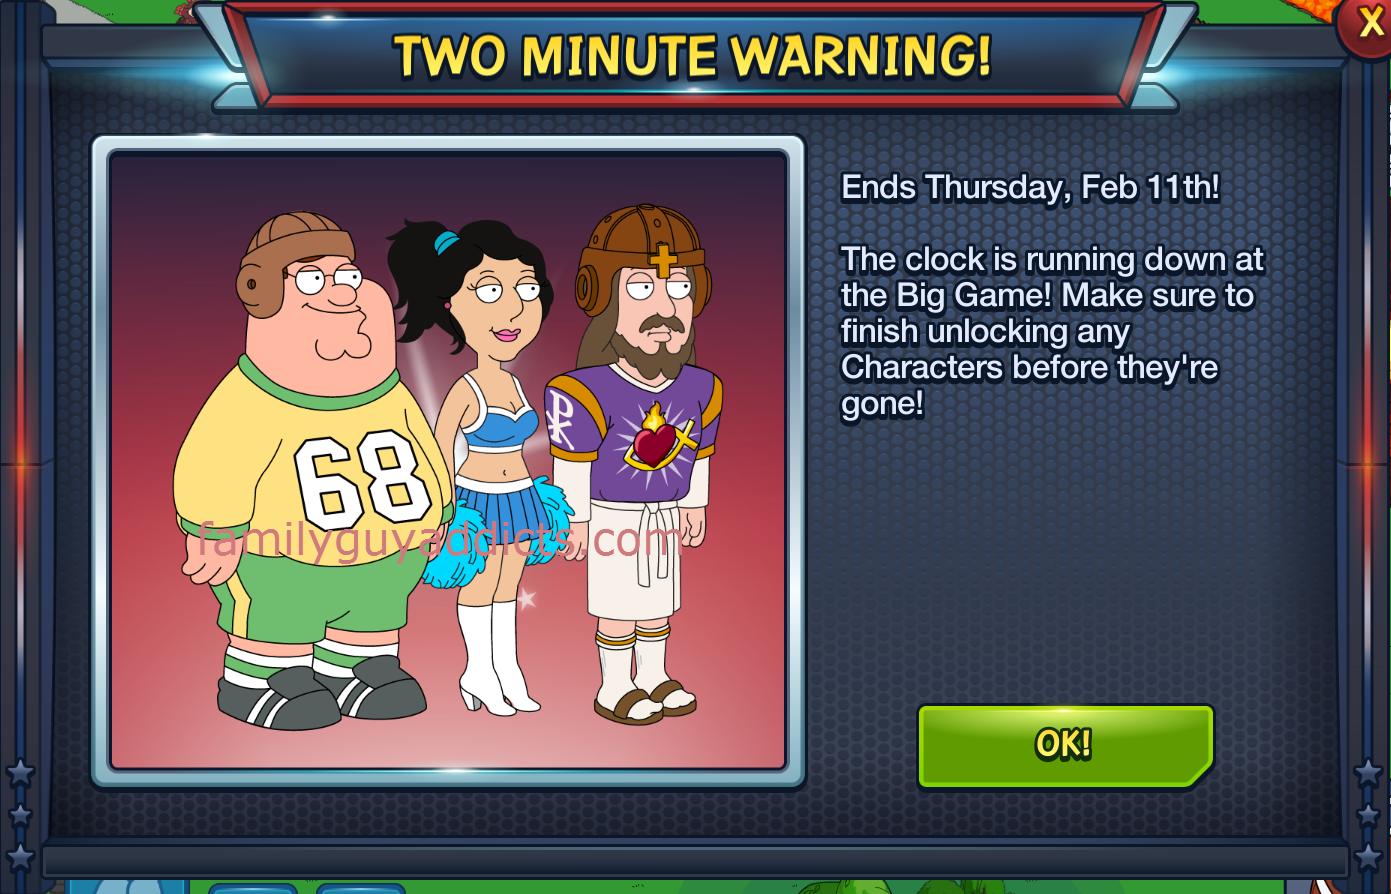 Family Guy Photo Finish